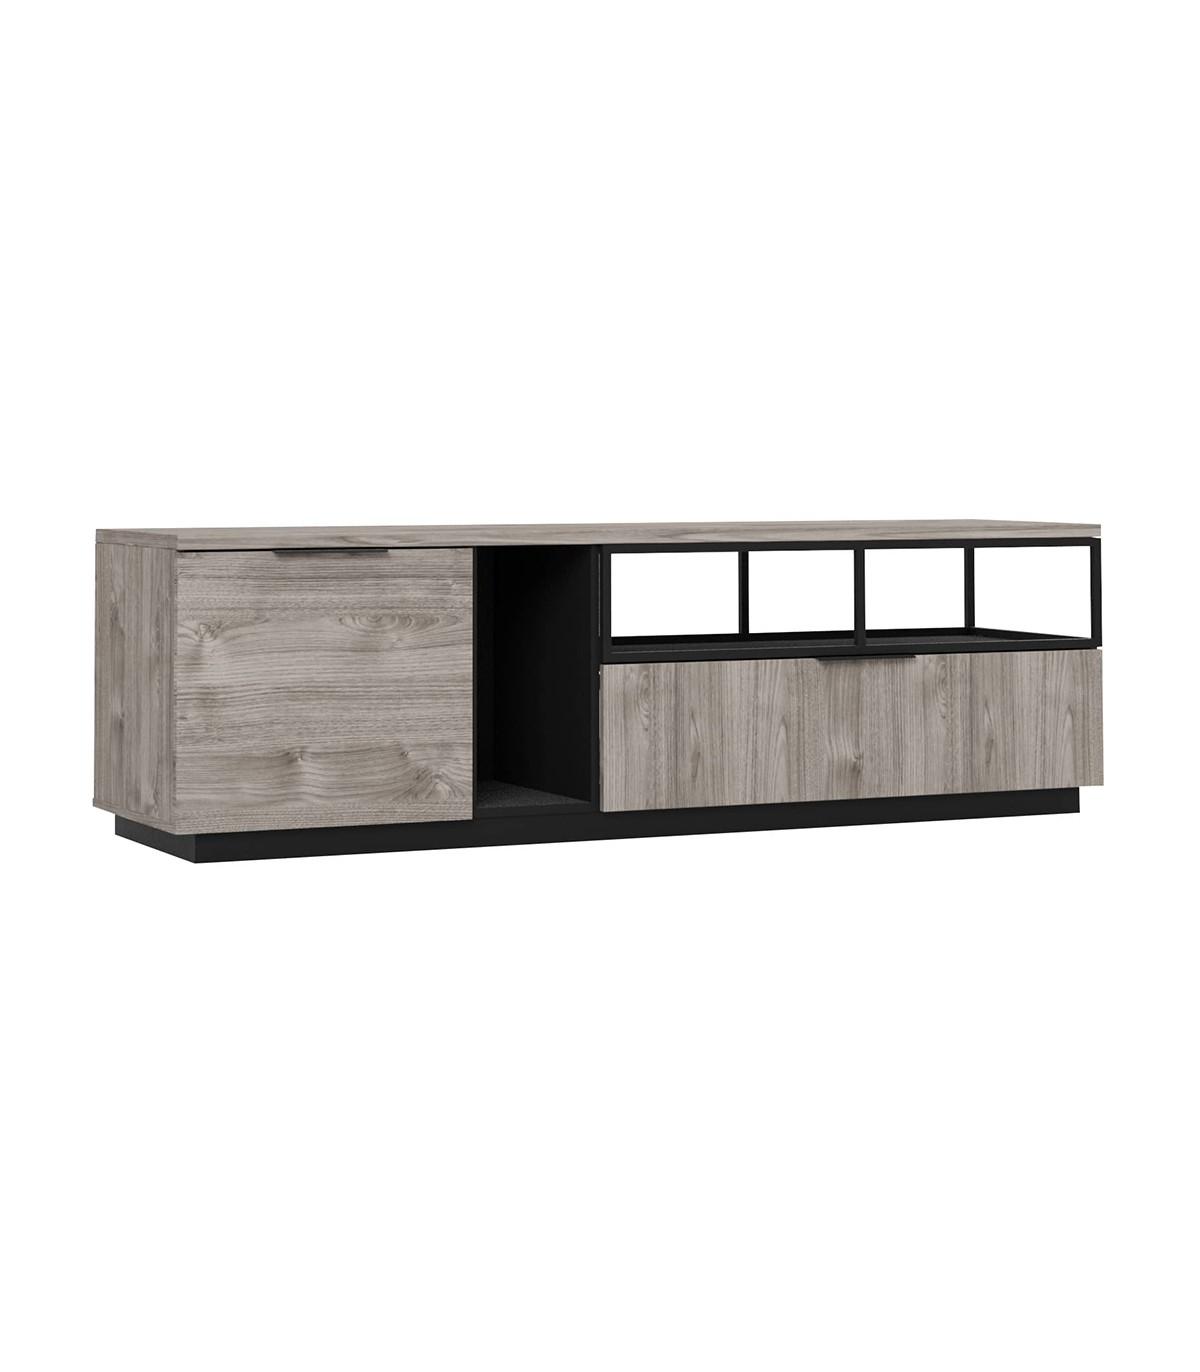 Meuble TV Hifi 1 porte 1 tiroir avec niches de rangements - Marron